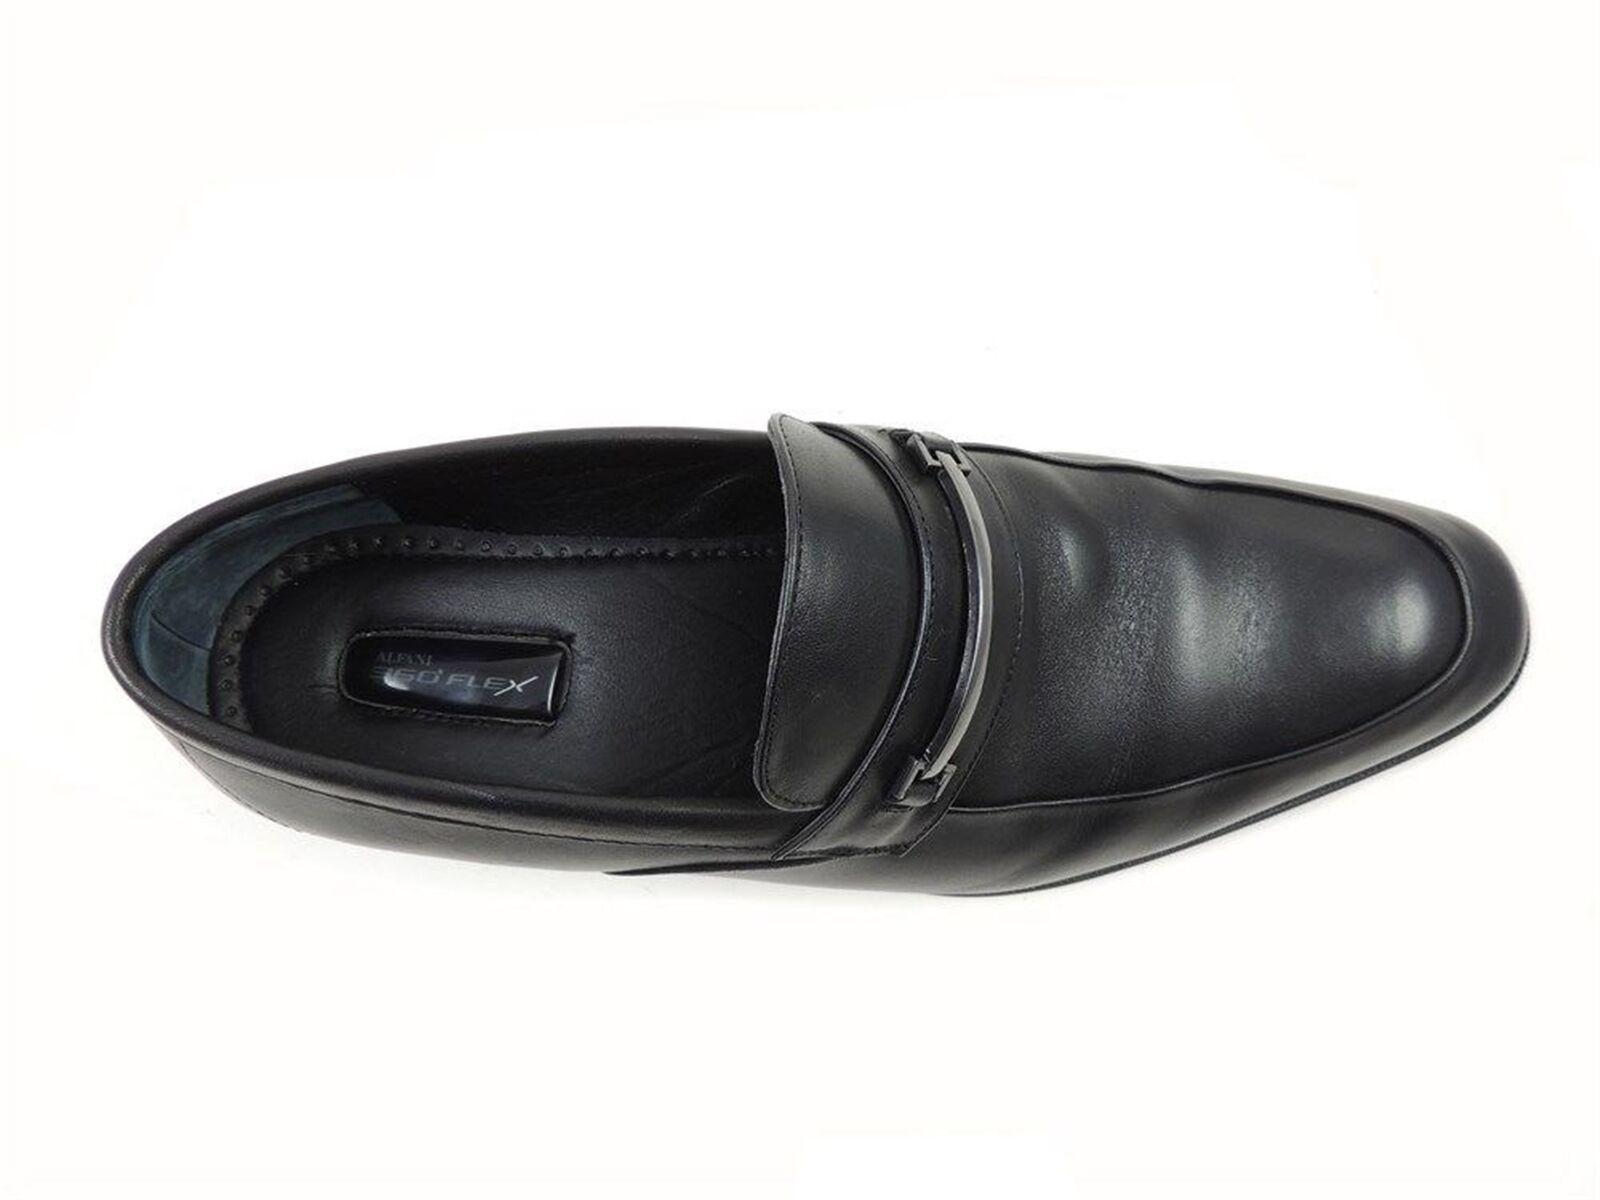 202367 SP50 Men/'s Shoes Size 9 M Black Leather Slip On Johnston /& Murphy